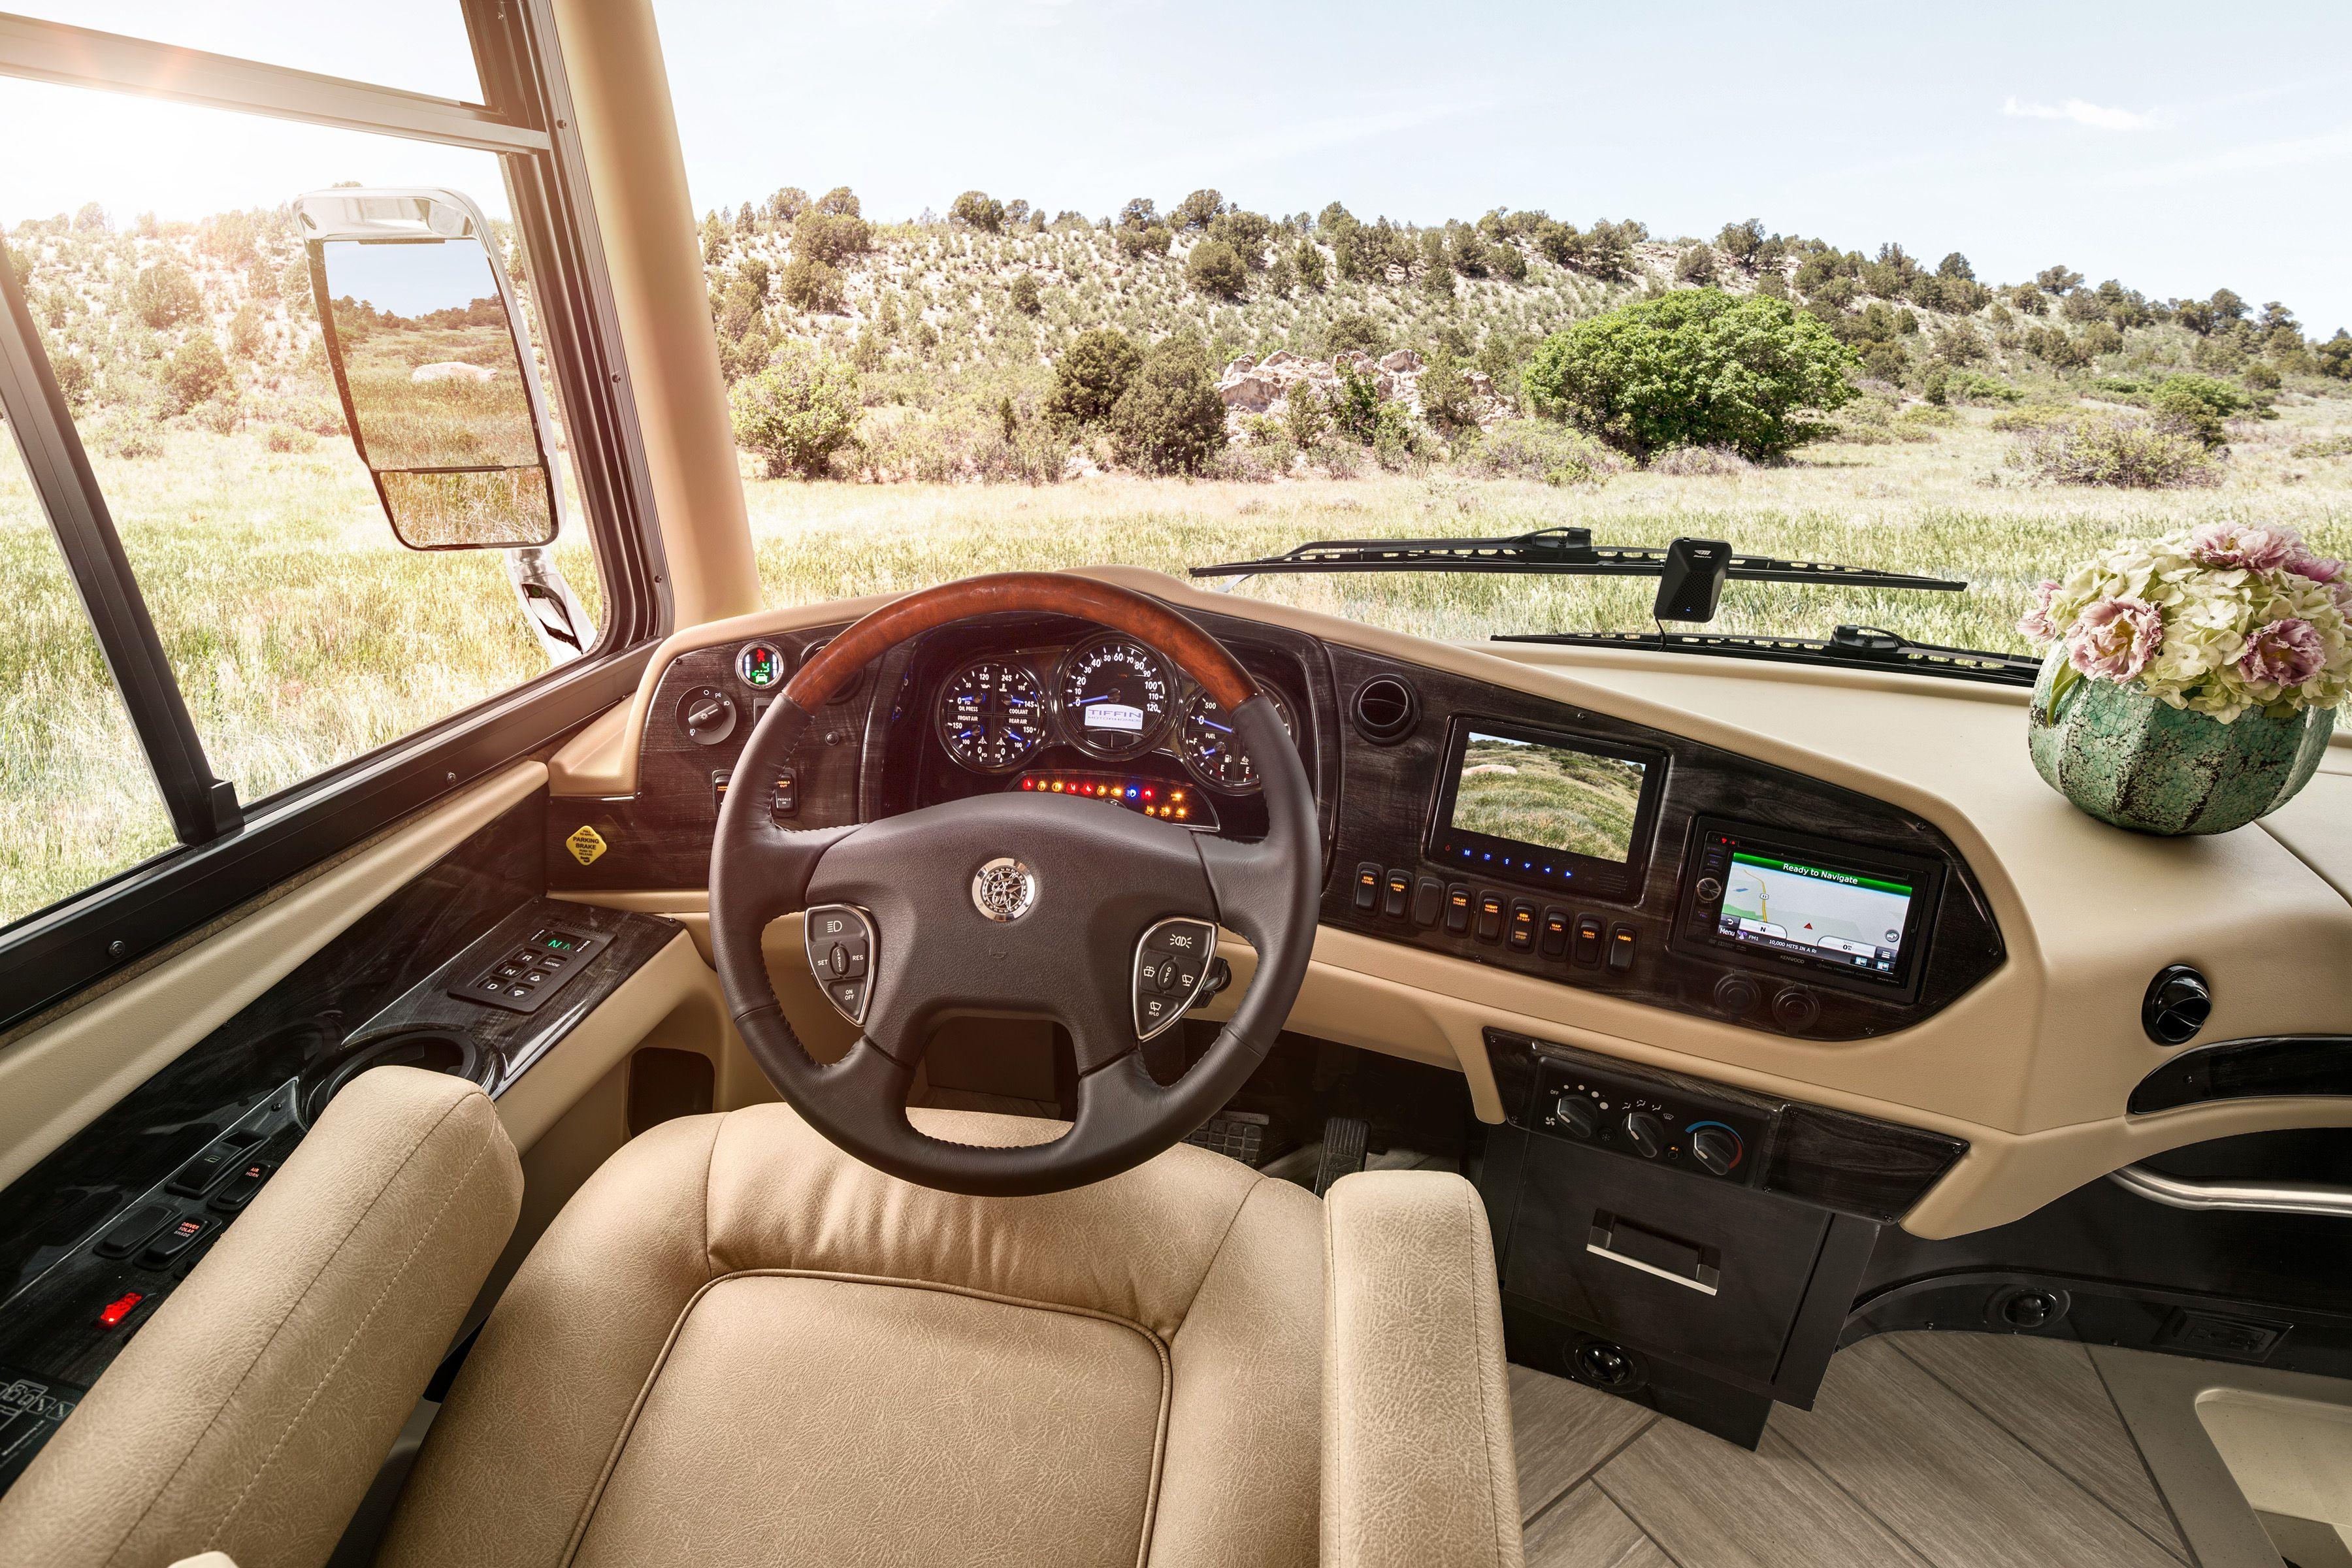 2015 Allegro Bus Driver Compartment Cockpit Cockpit Bus Tiffin Motorhomes